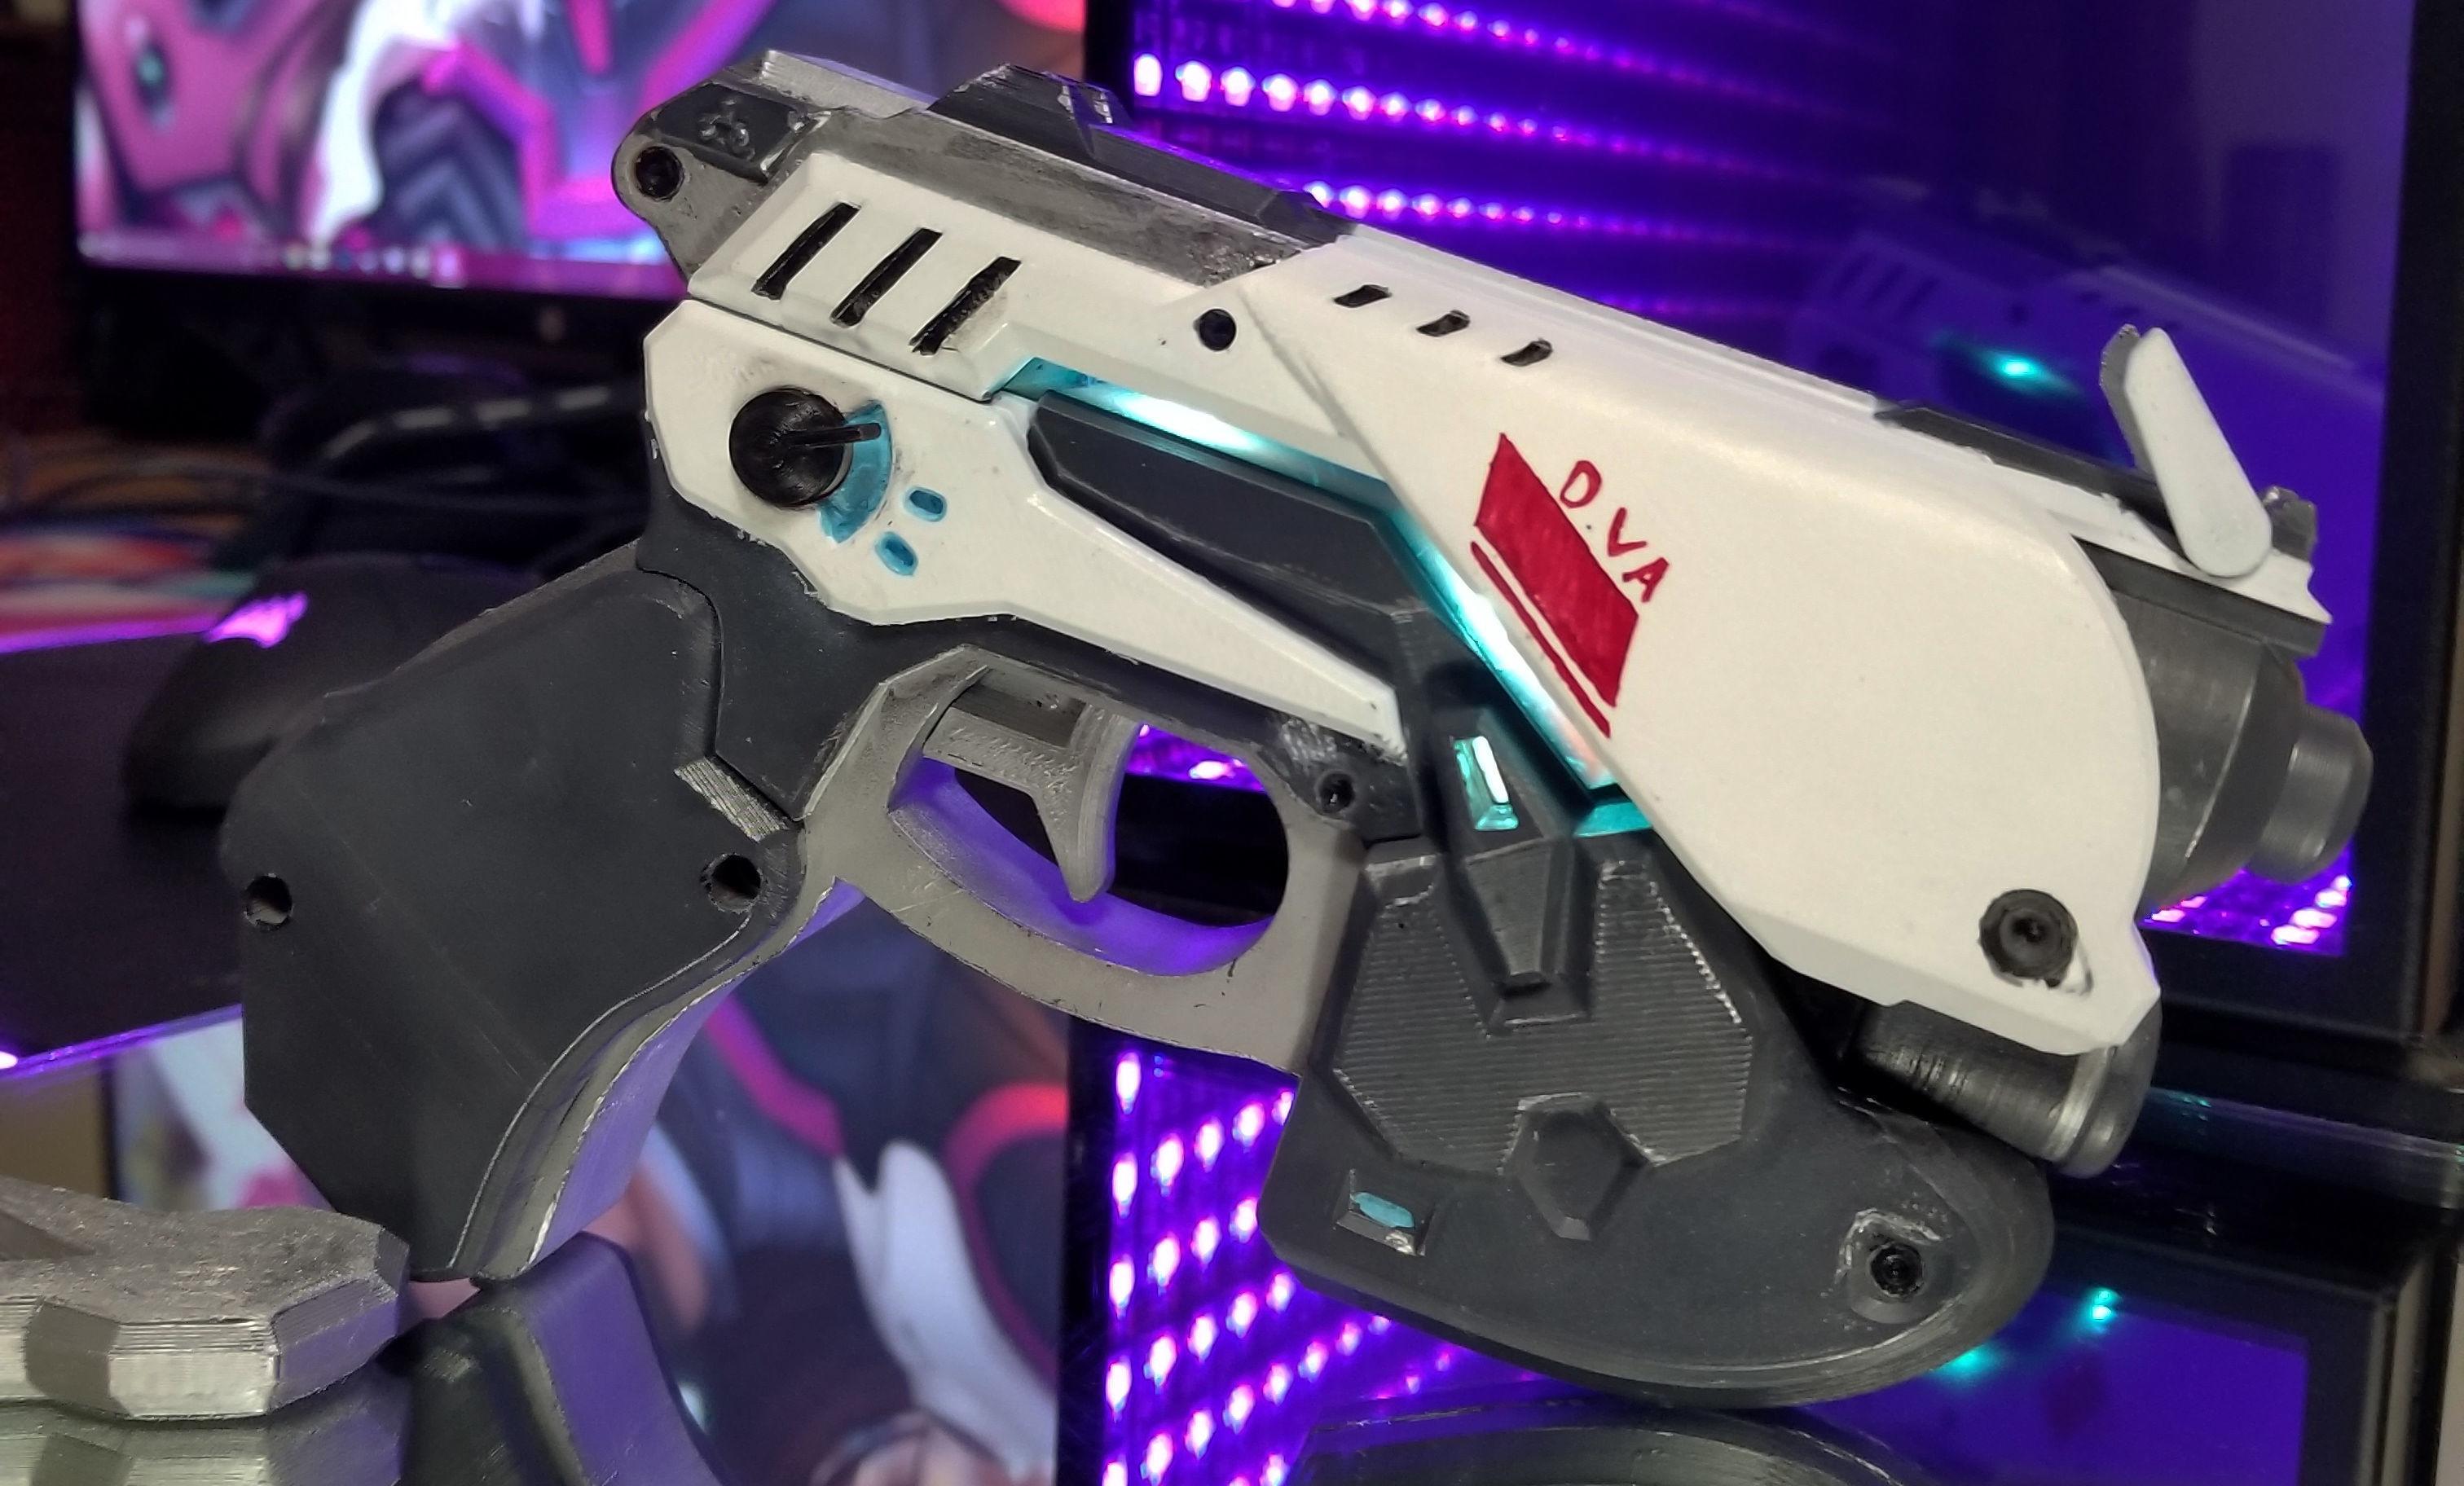 Dva LED Pistol Cosplay Prop